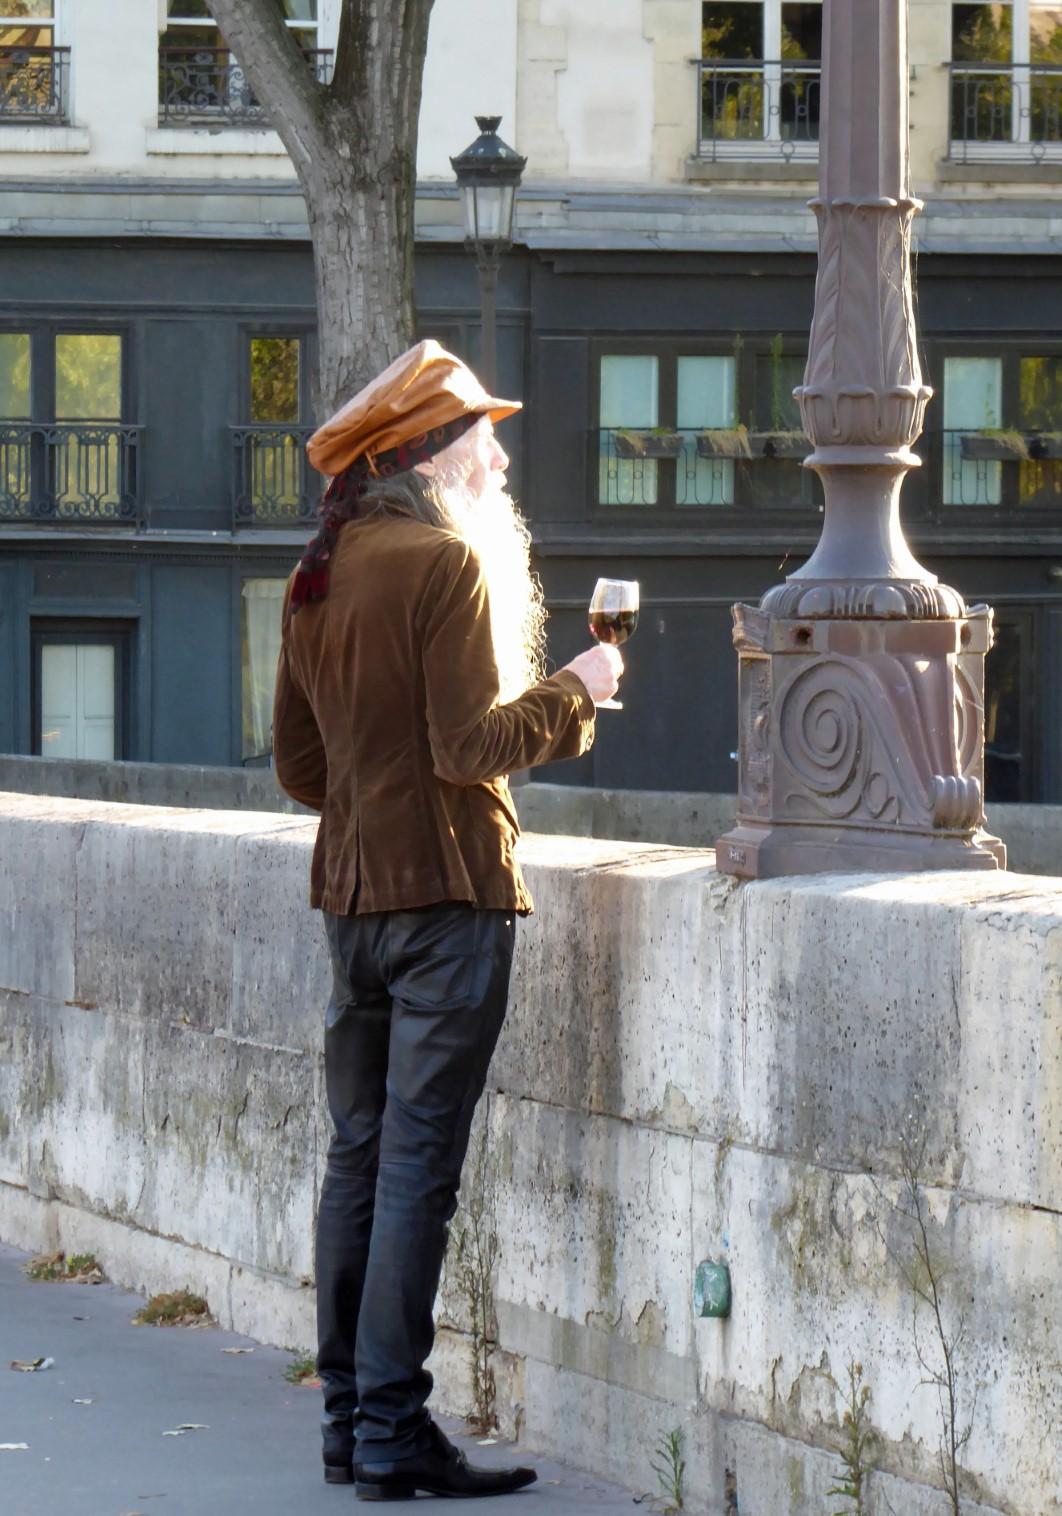 Man with a beard drinking wine on a bridge